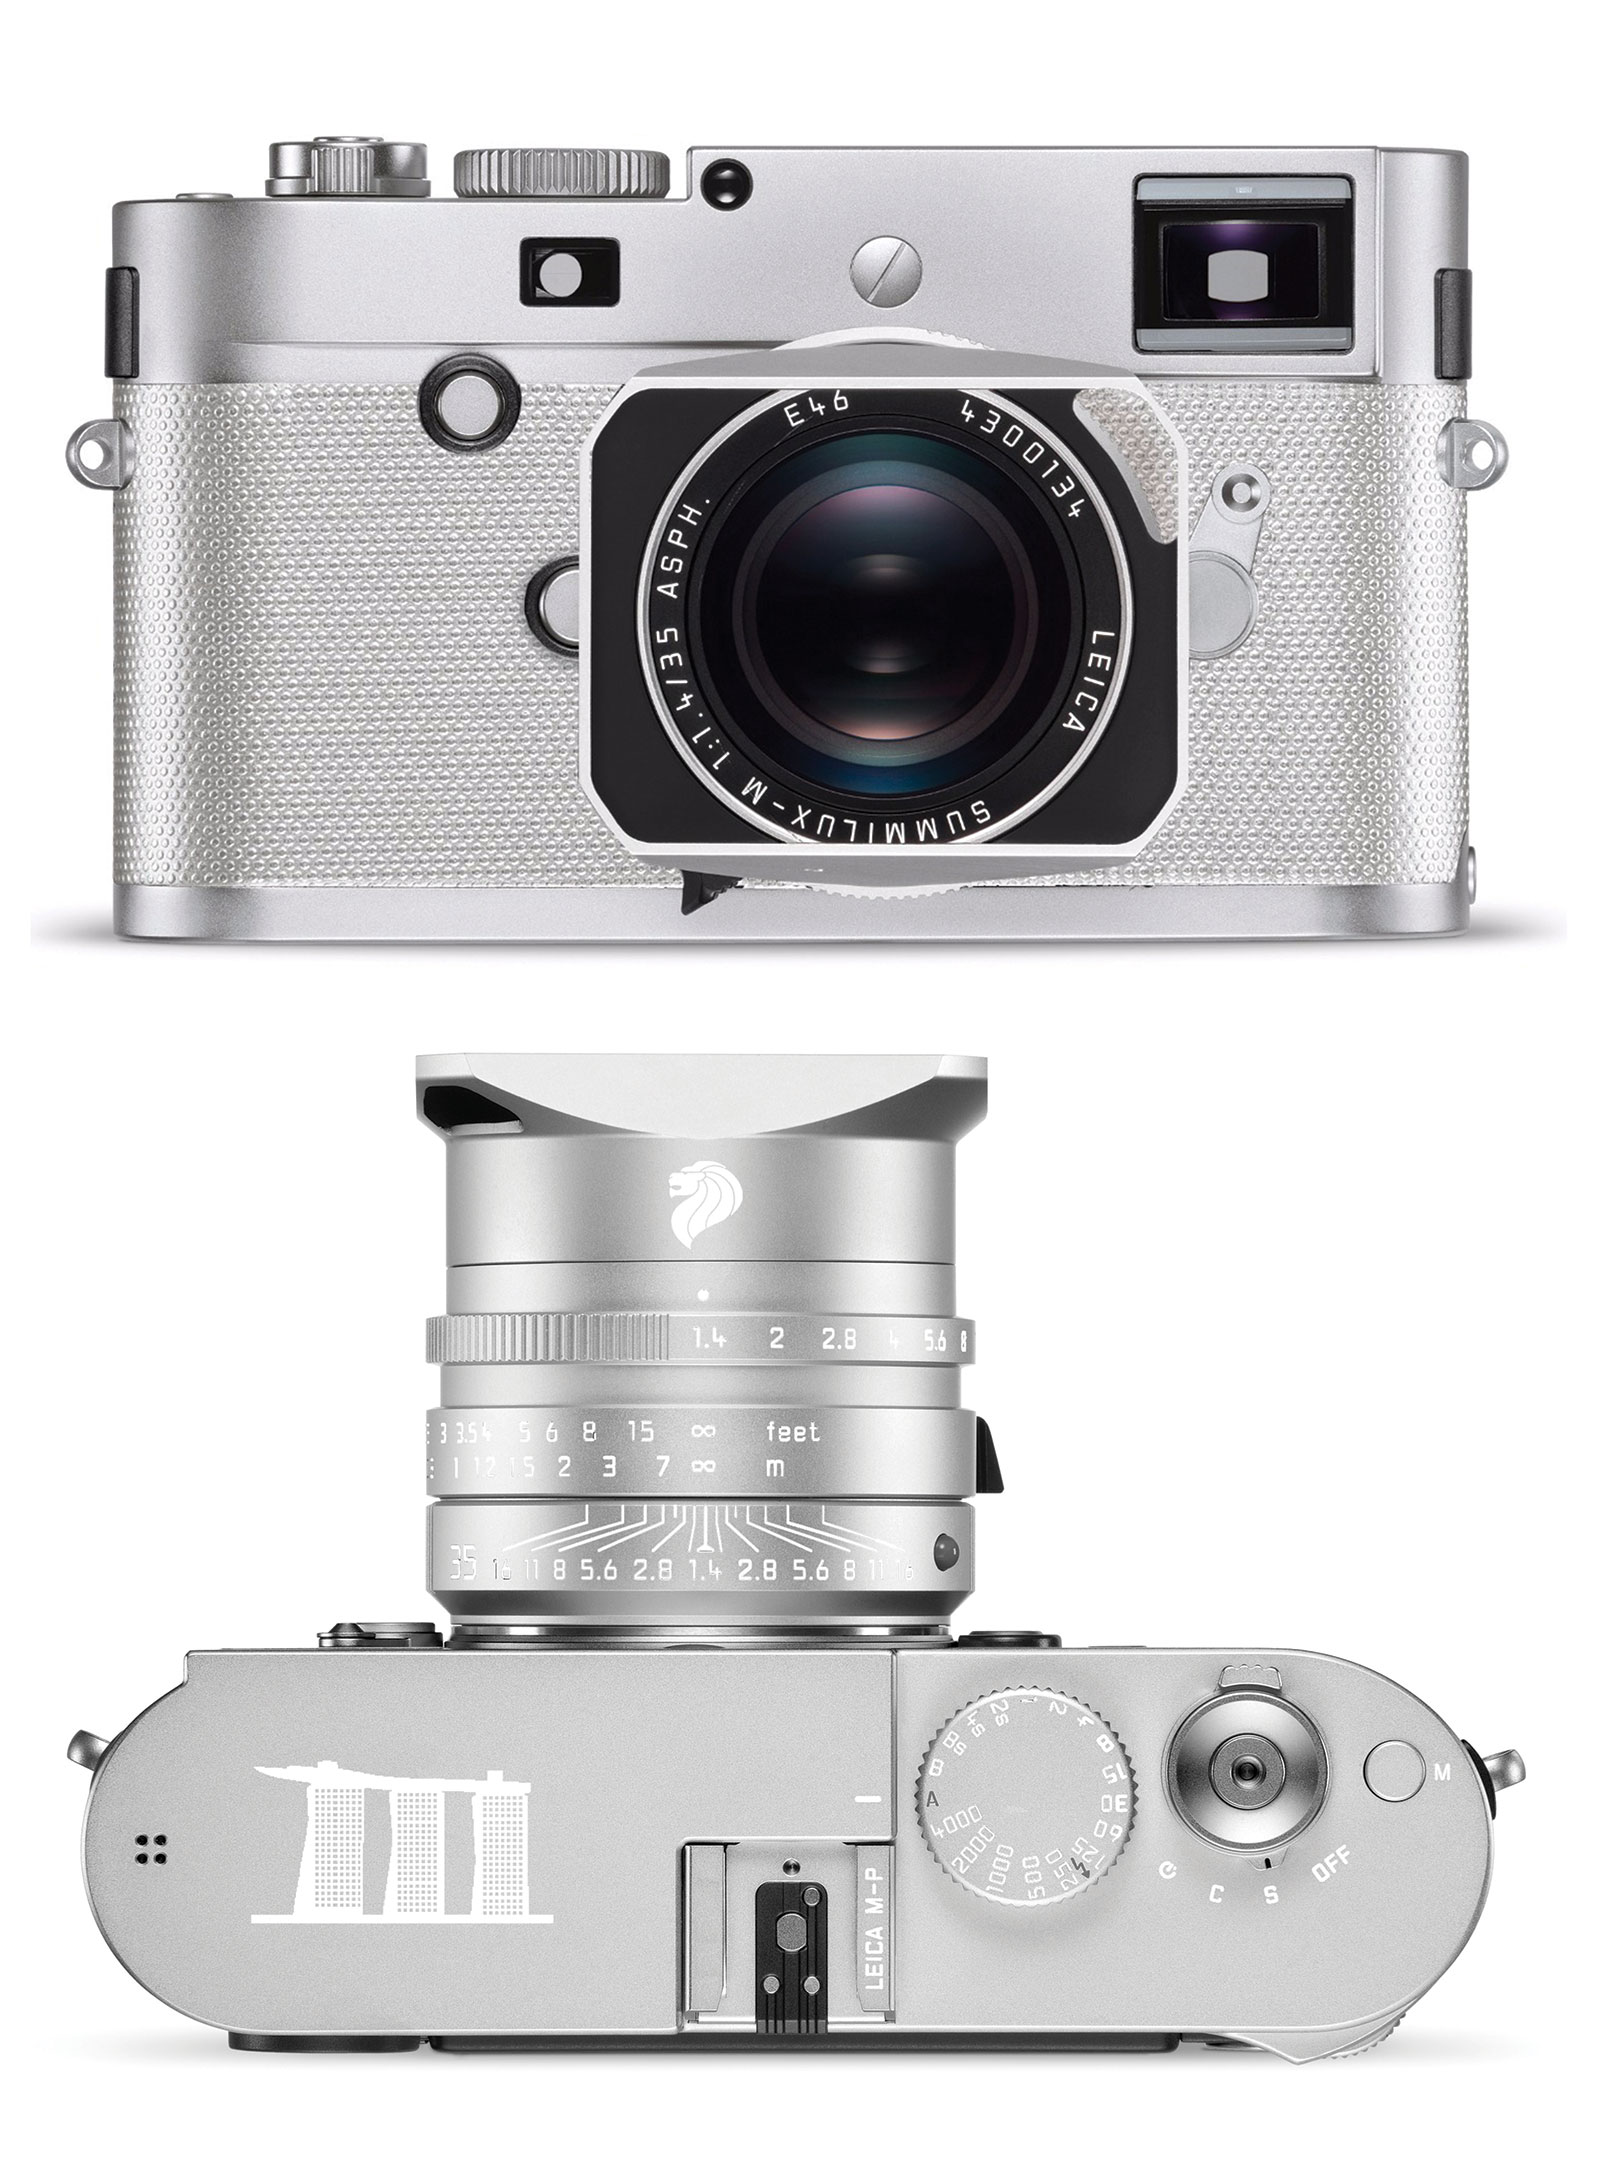 Leica M-P Singapore Marina Bay Sands edition